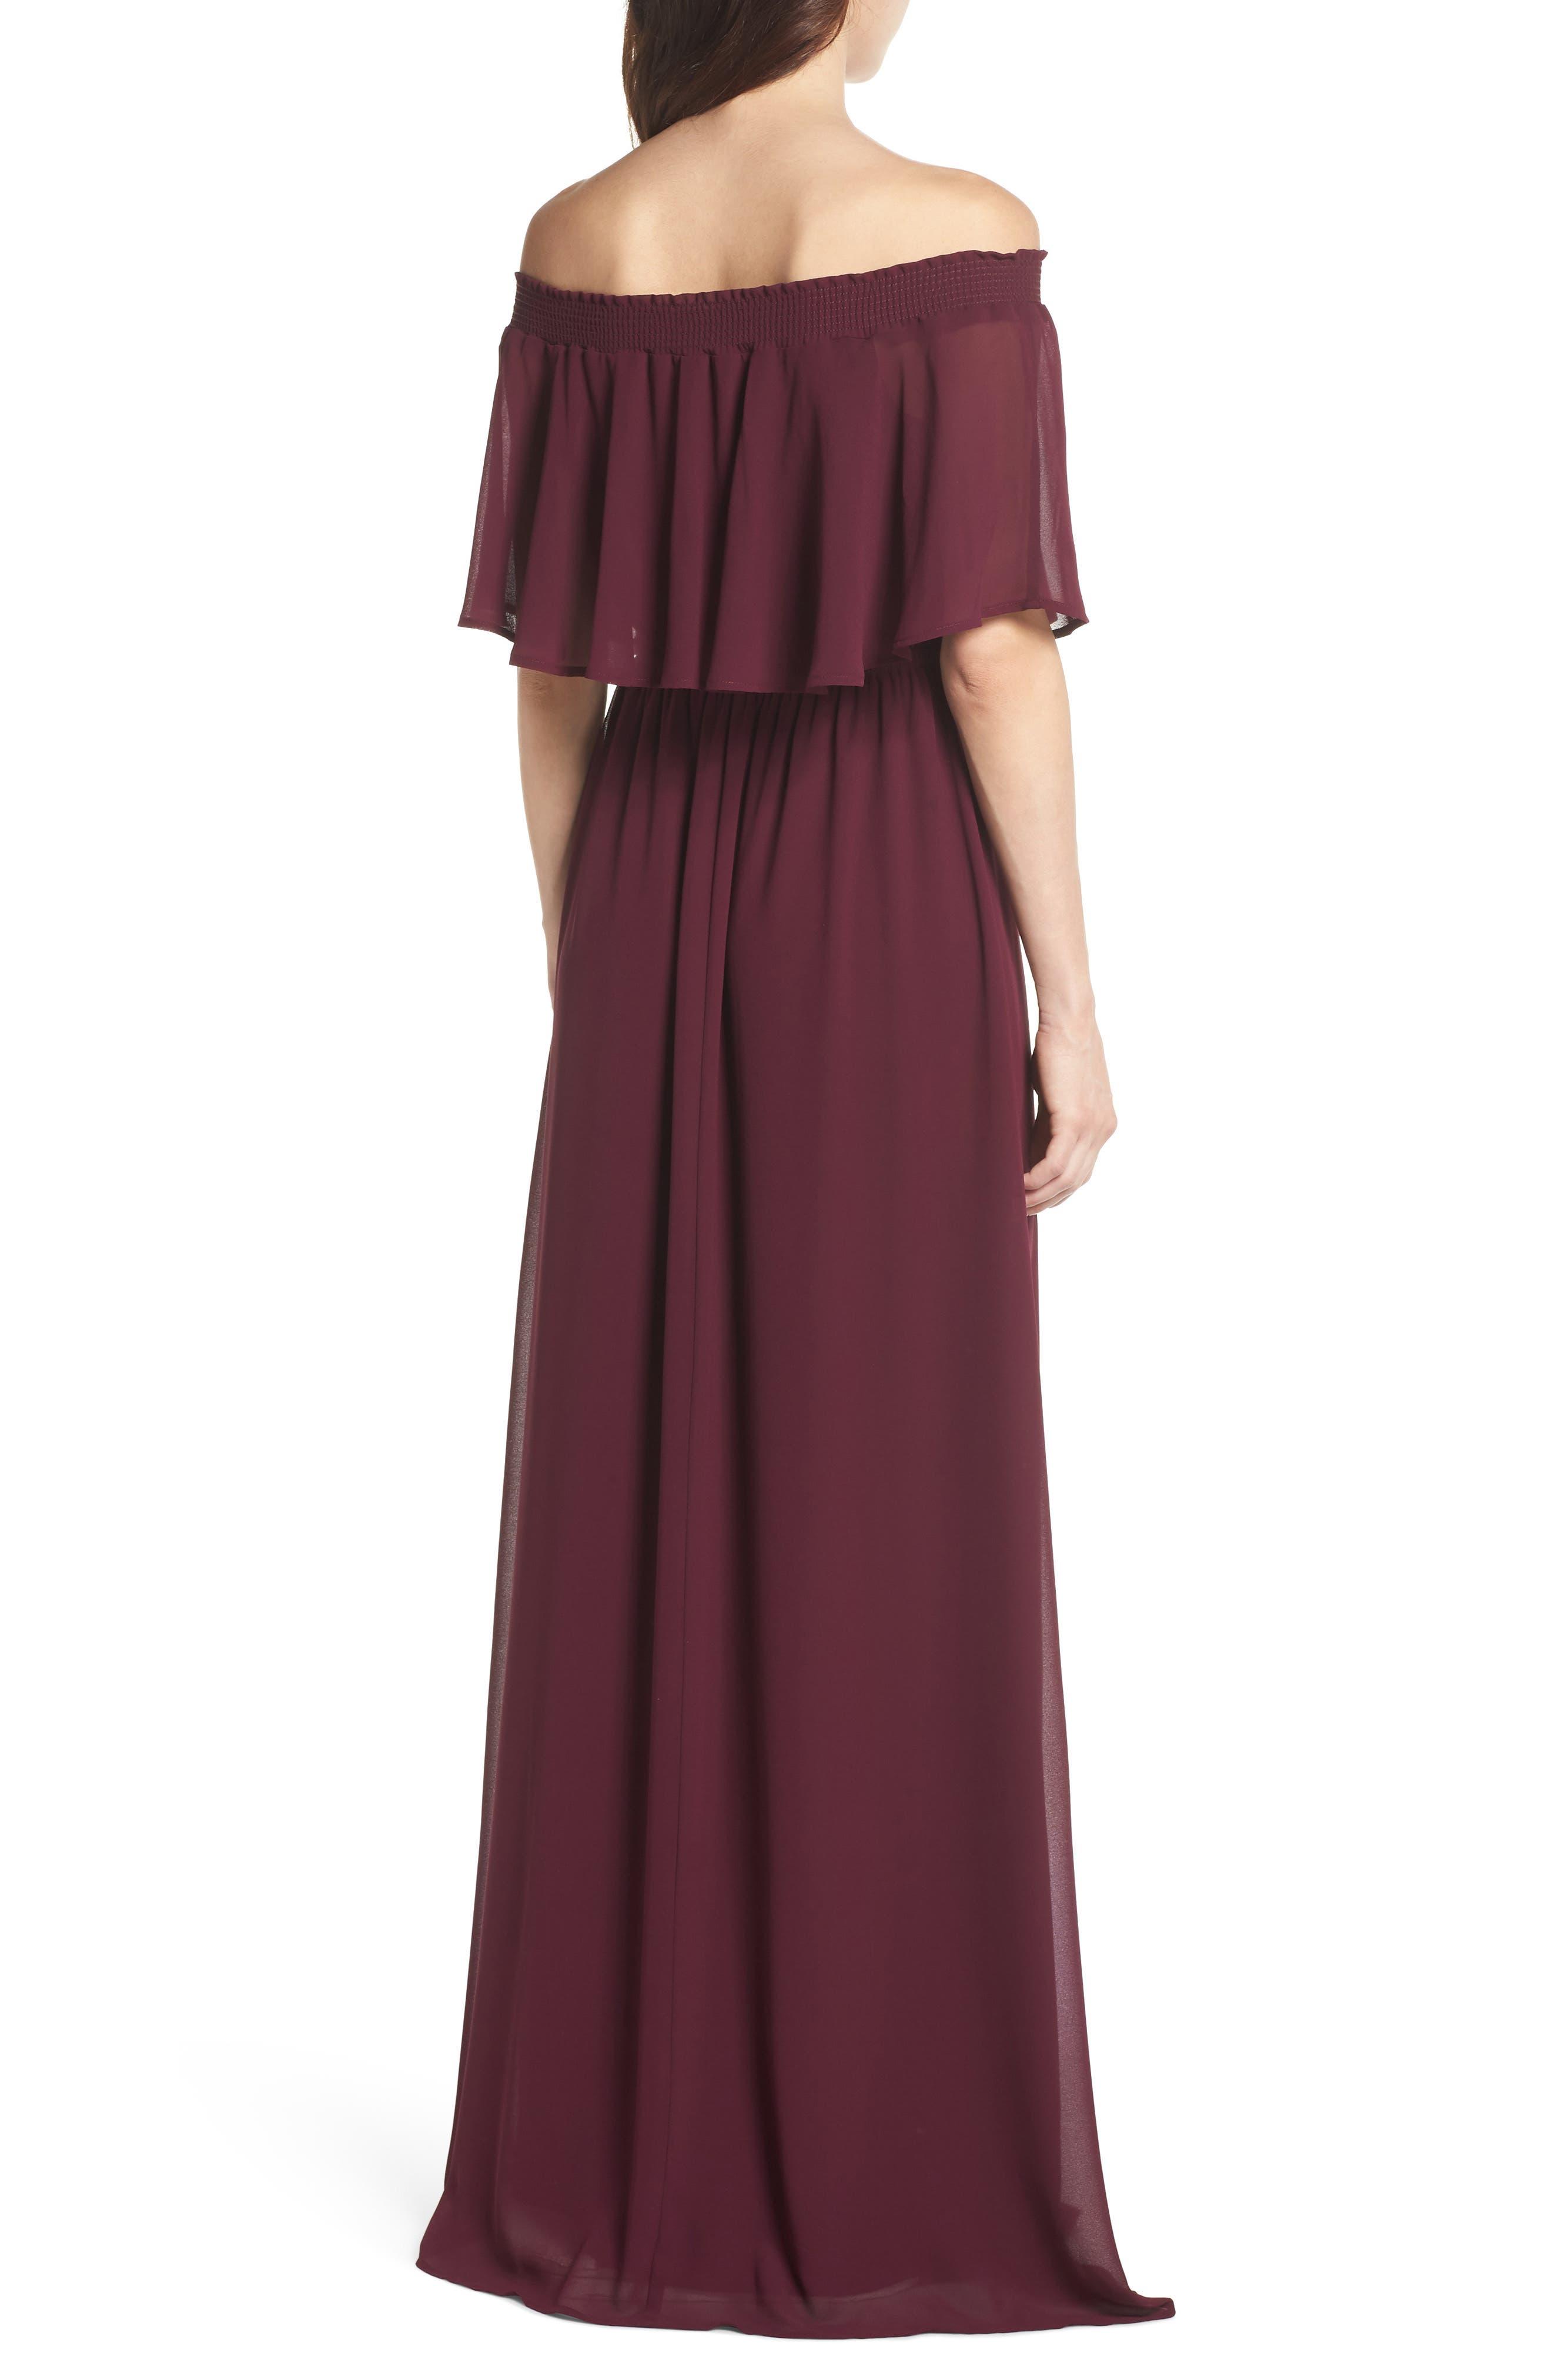 Womens Show Me Your Mumu Dresses Nordstrom Austin Flats Rene Maroon 40